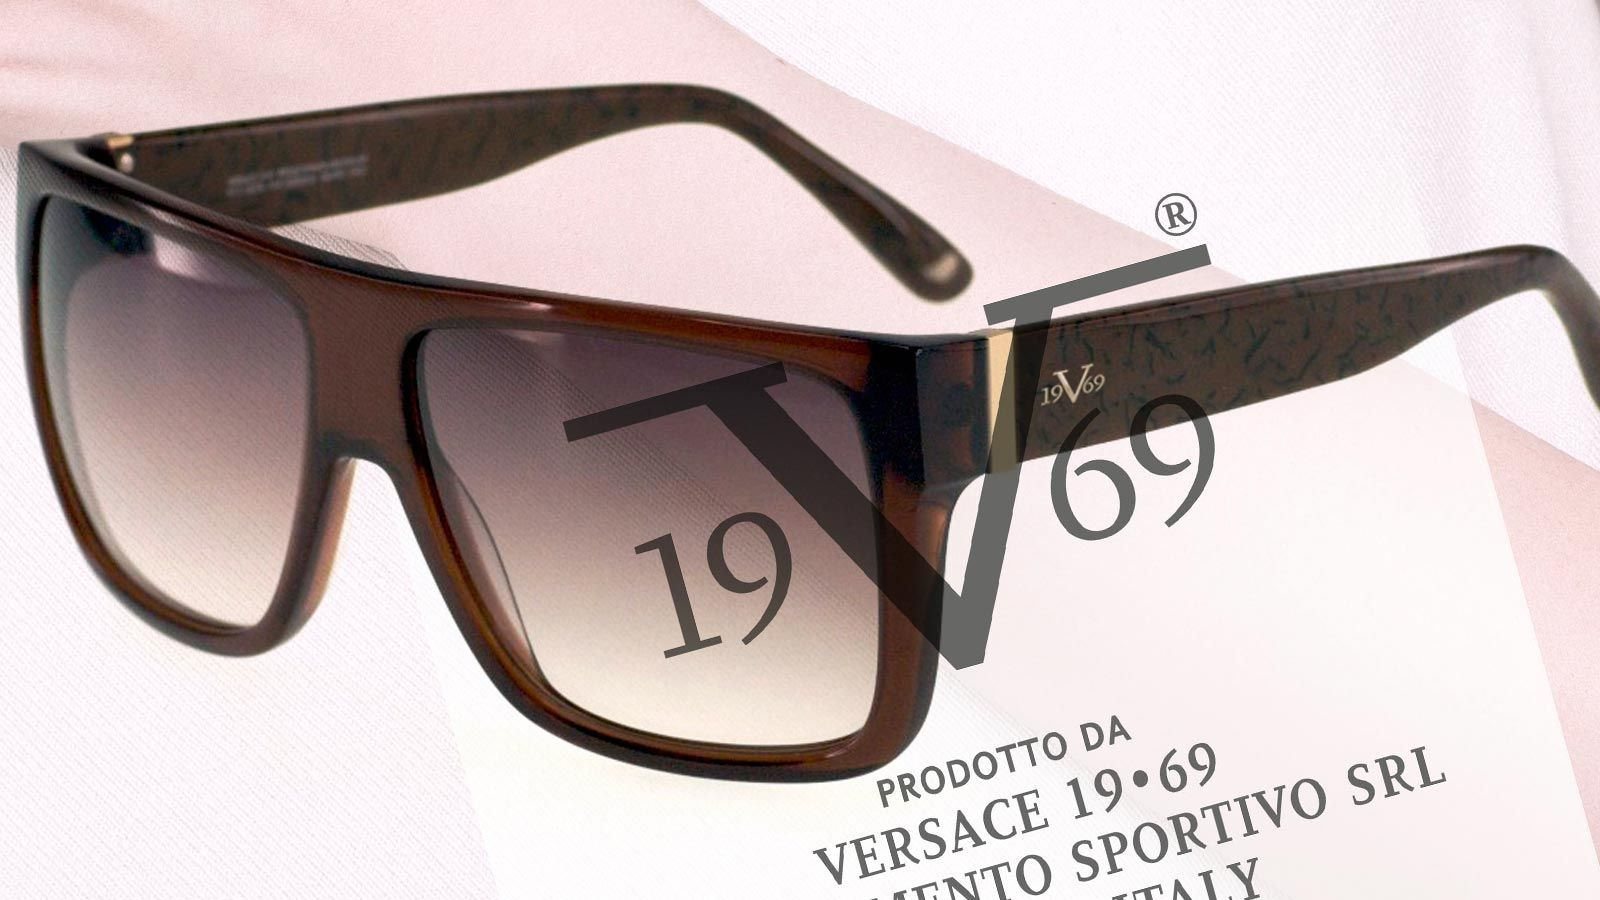 34ba5cf477cb Versace 19.69 Abbigliamento Sportivo | Versace19.69 | Fashion ...